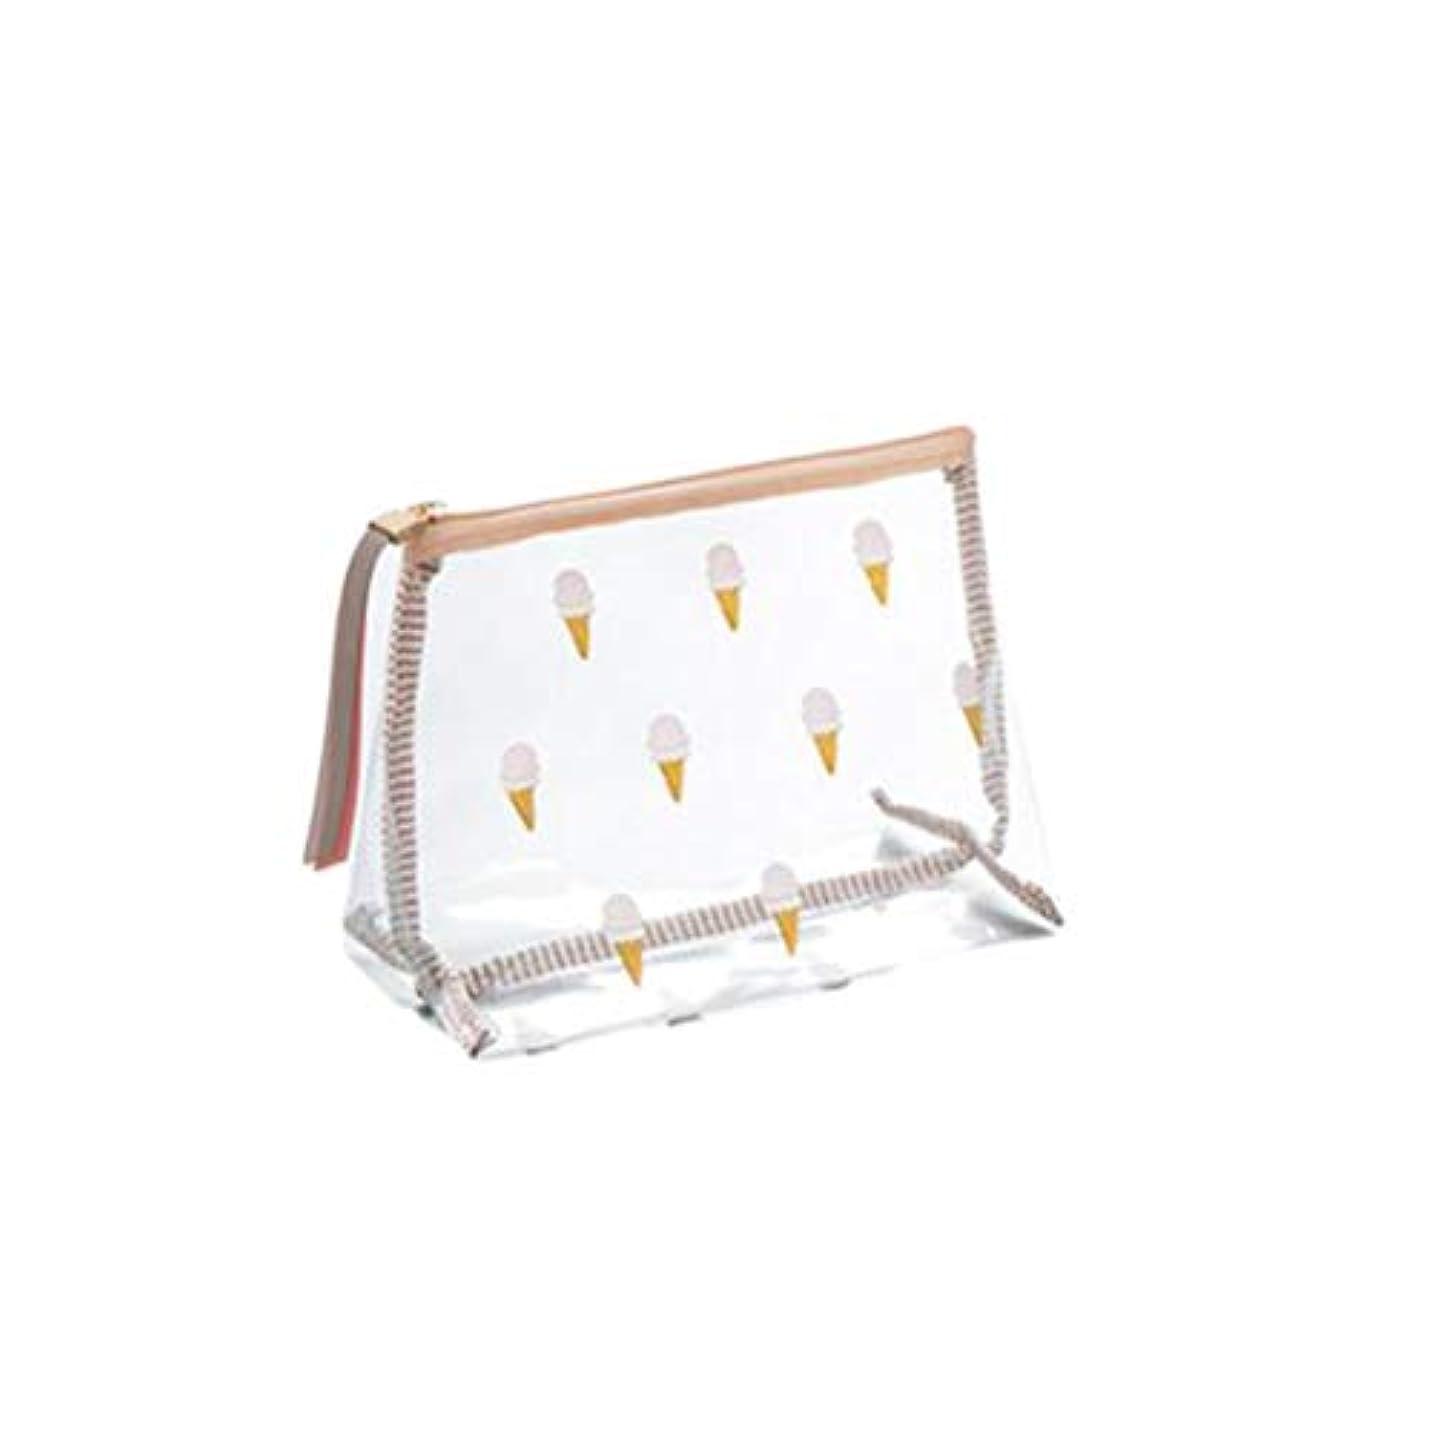 Frcolor 化粧ポーチ トラベルポーチ メイクポーチ アイスクリーム柄 かわいい 化粧小物収納ポーチ コンパクト 旅行用 透明(サイズS)